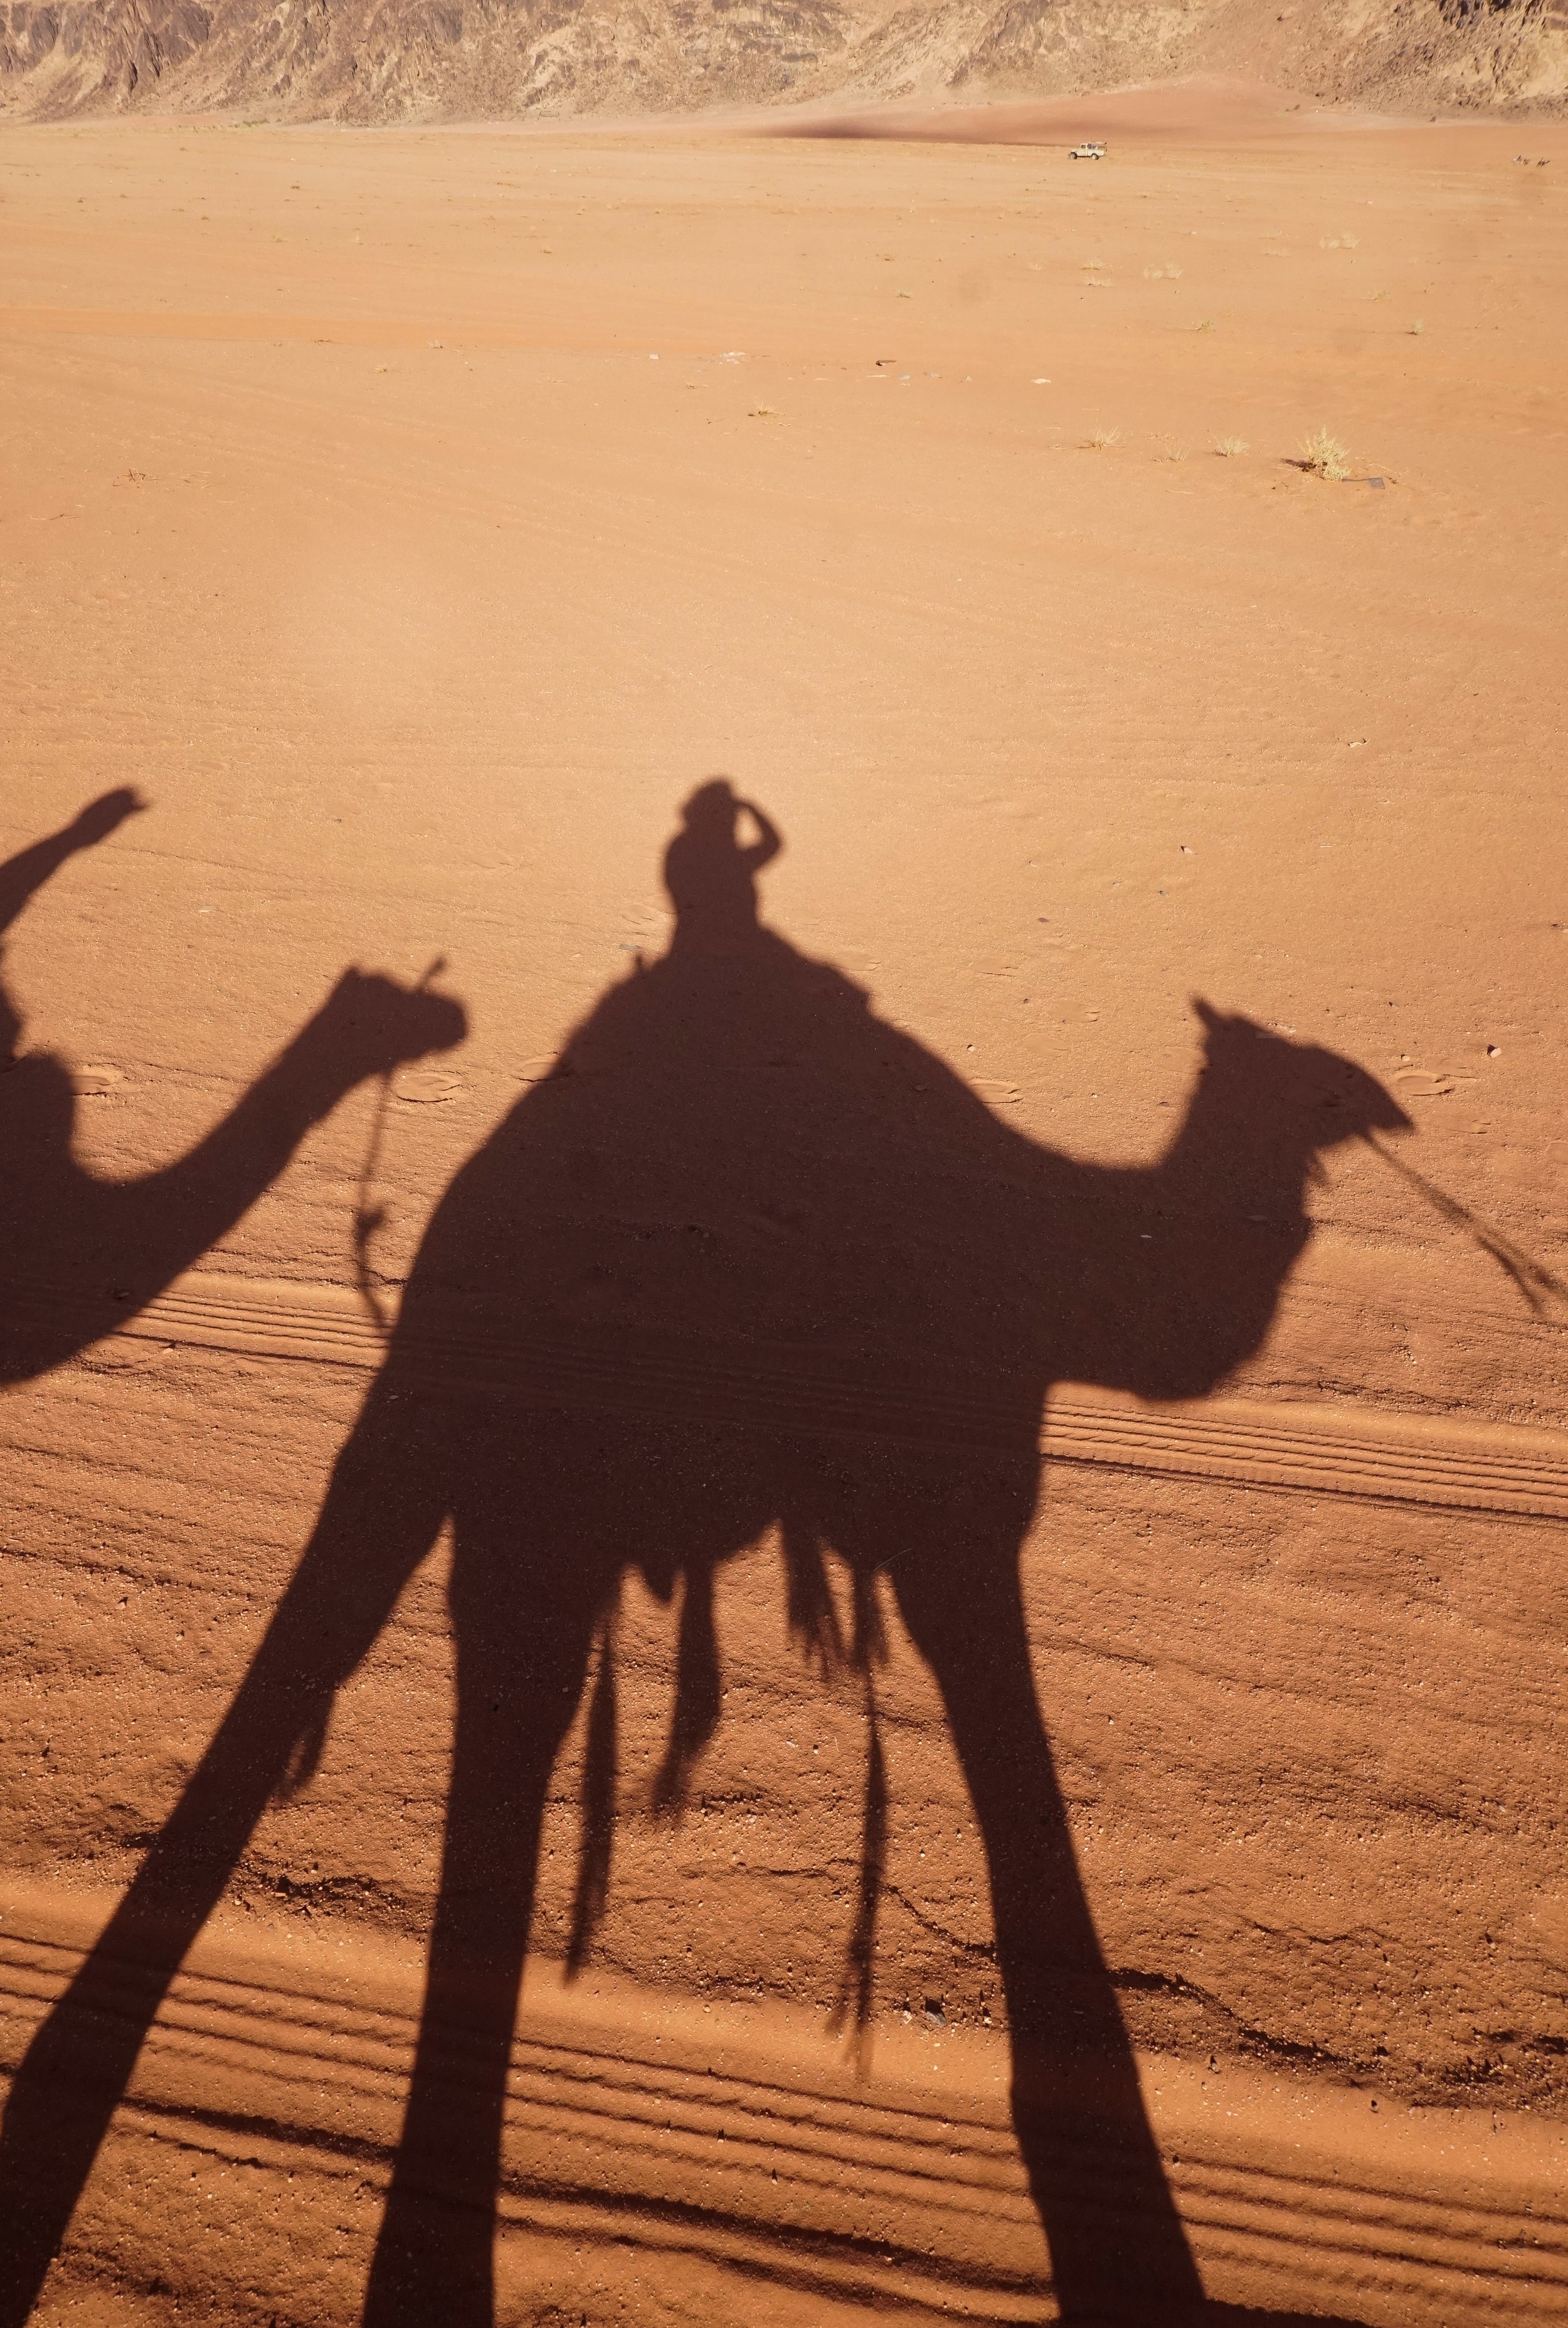 curio.trips.jordan.wadi.rum.camel.shadow.portrait.jpg